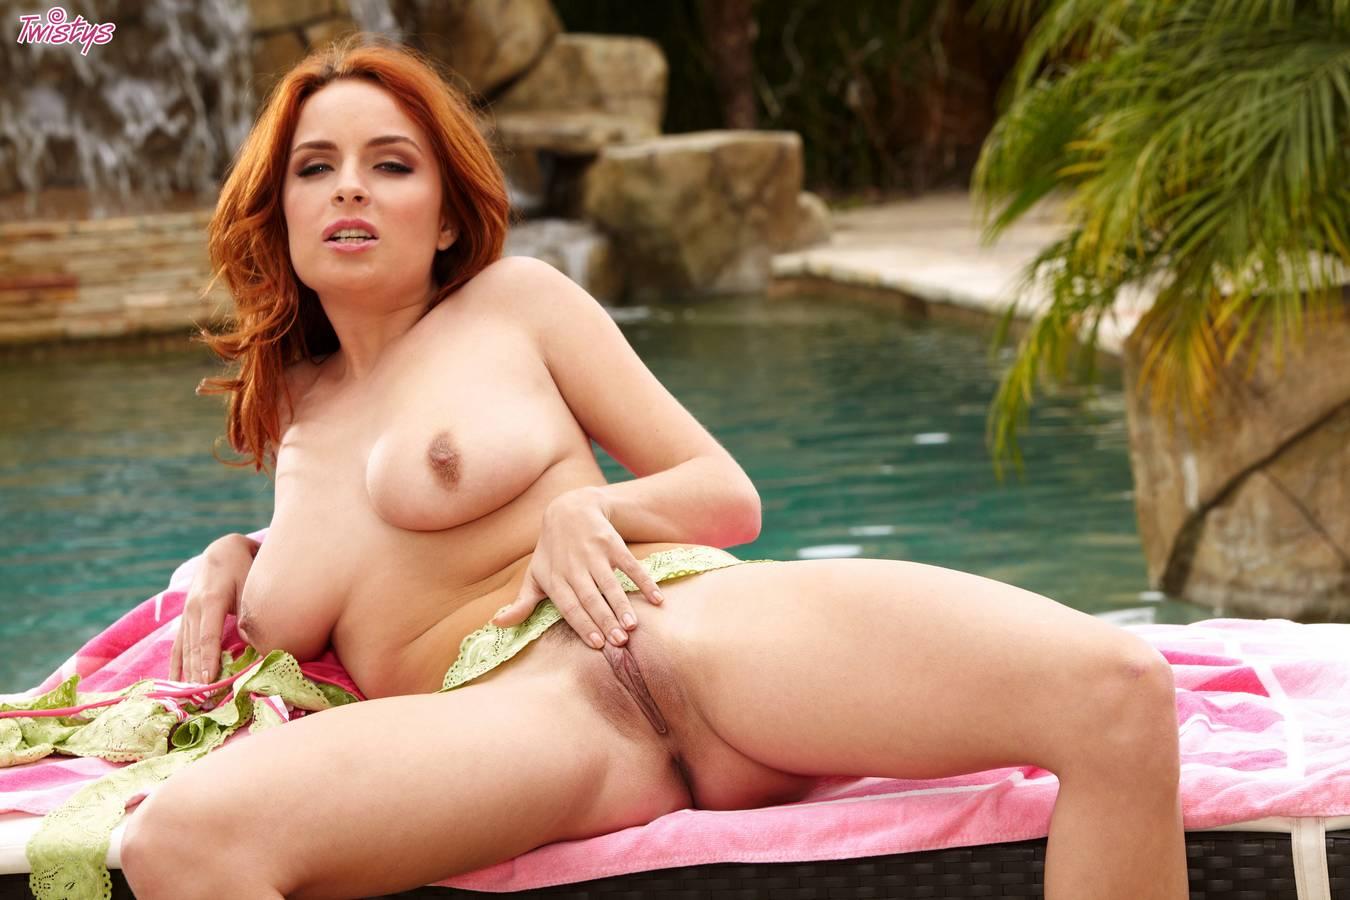 Sydney james nude